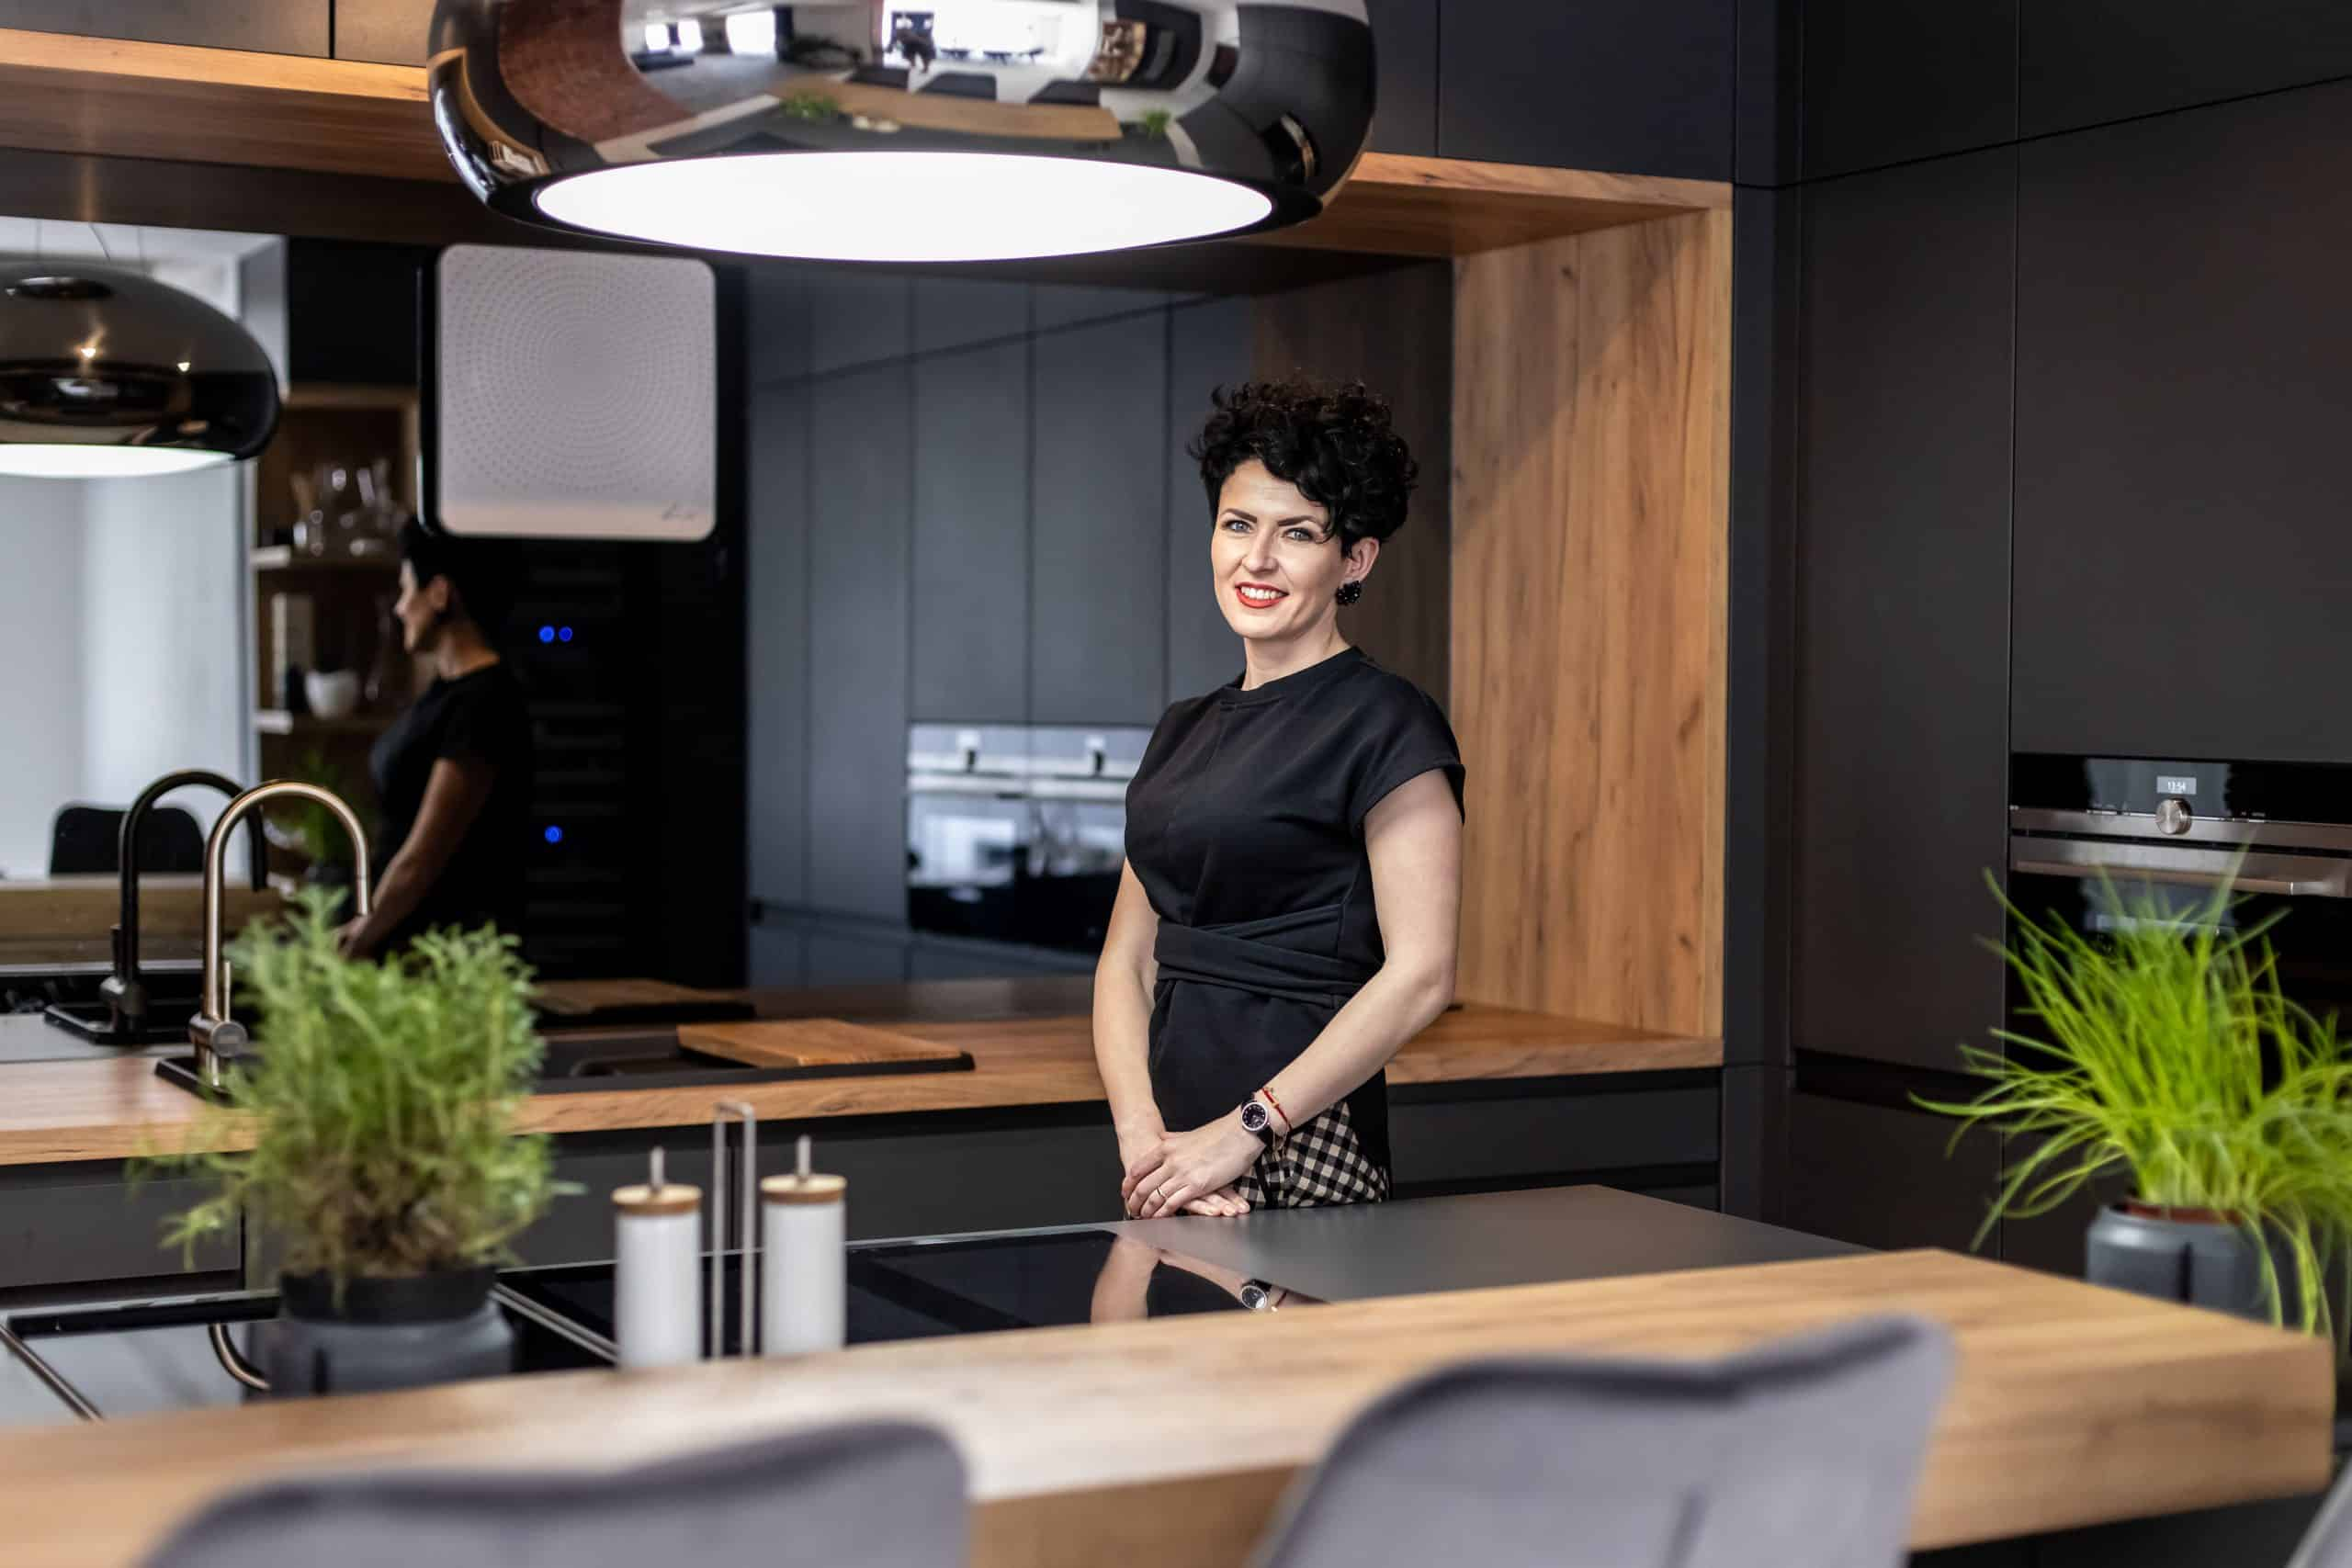 antracitová kuchyňa od ikuchyne s podnikatelkou roka